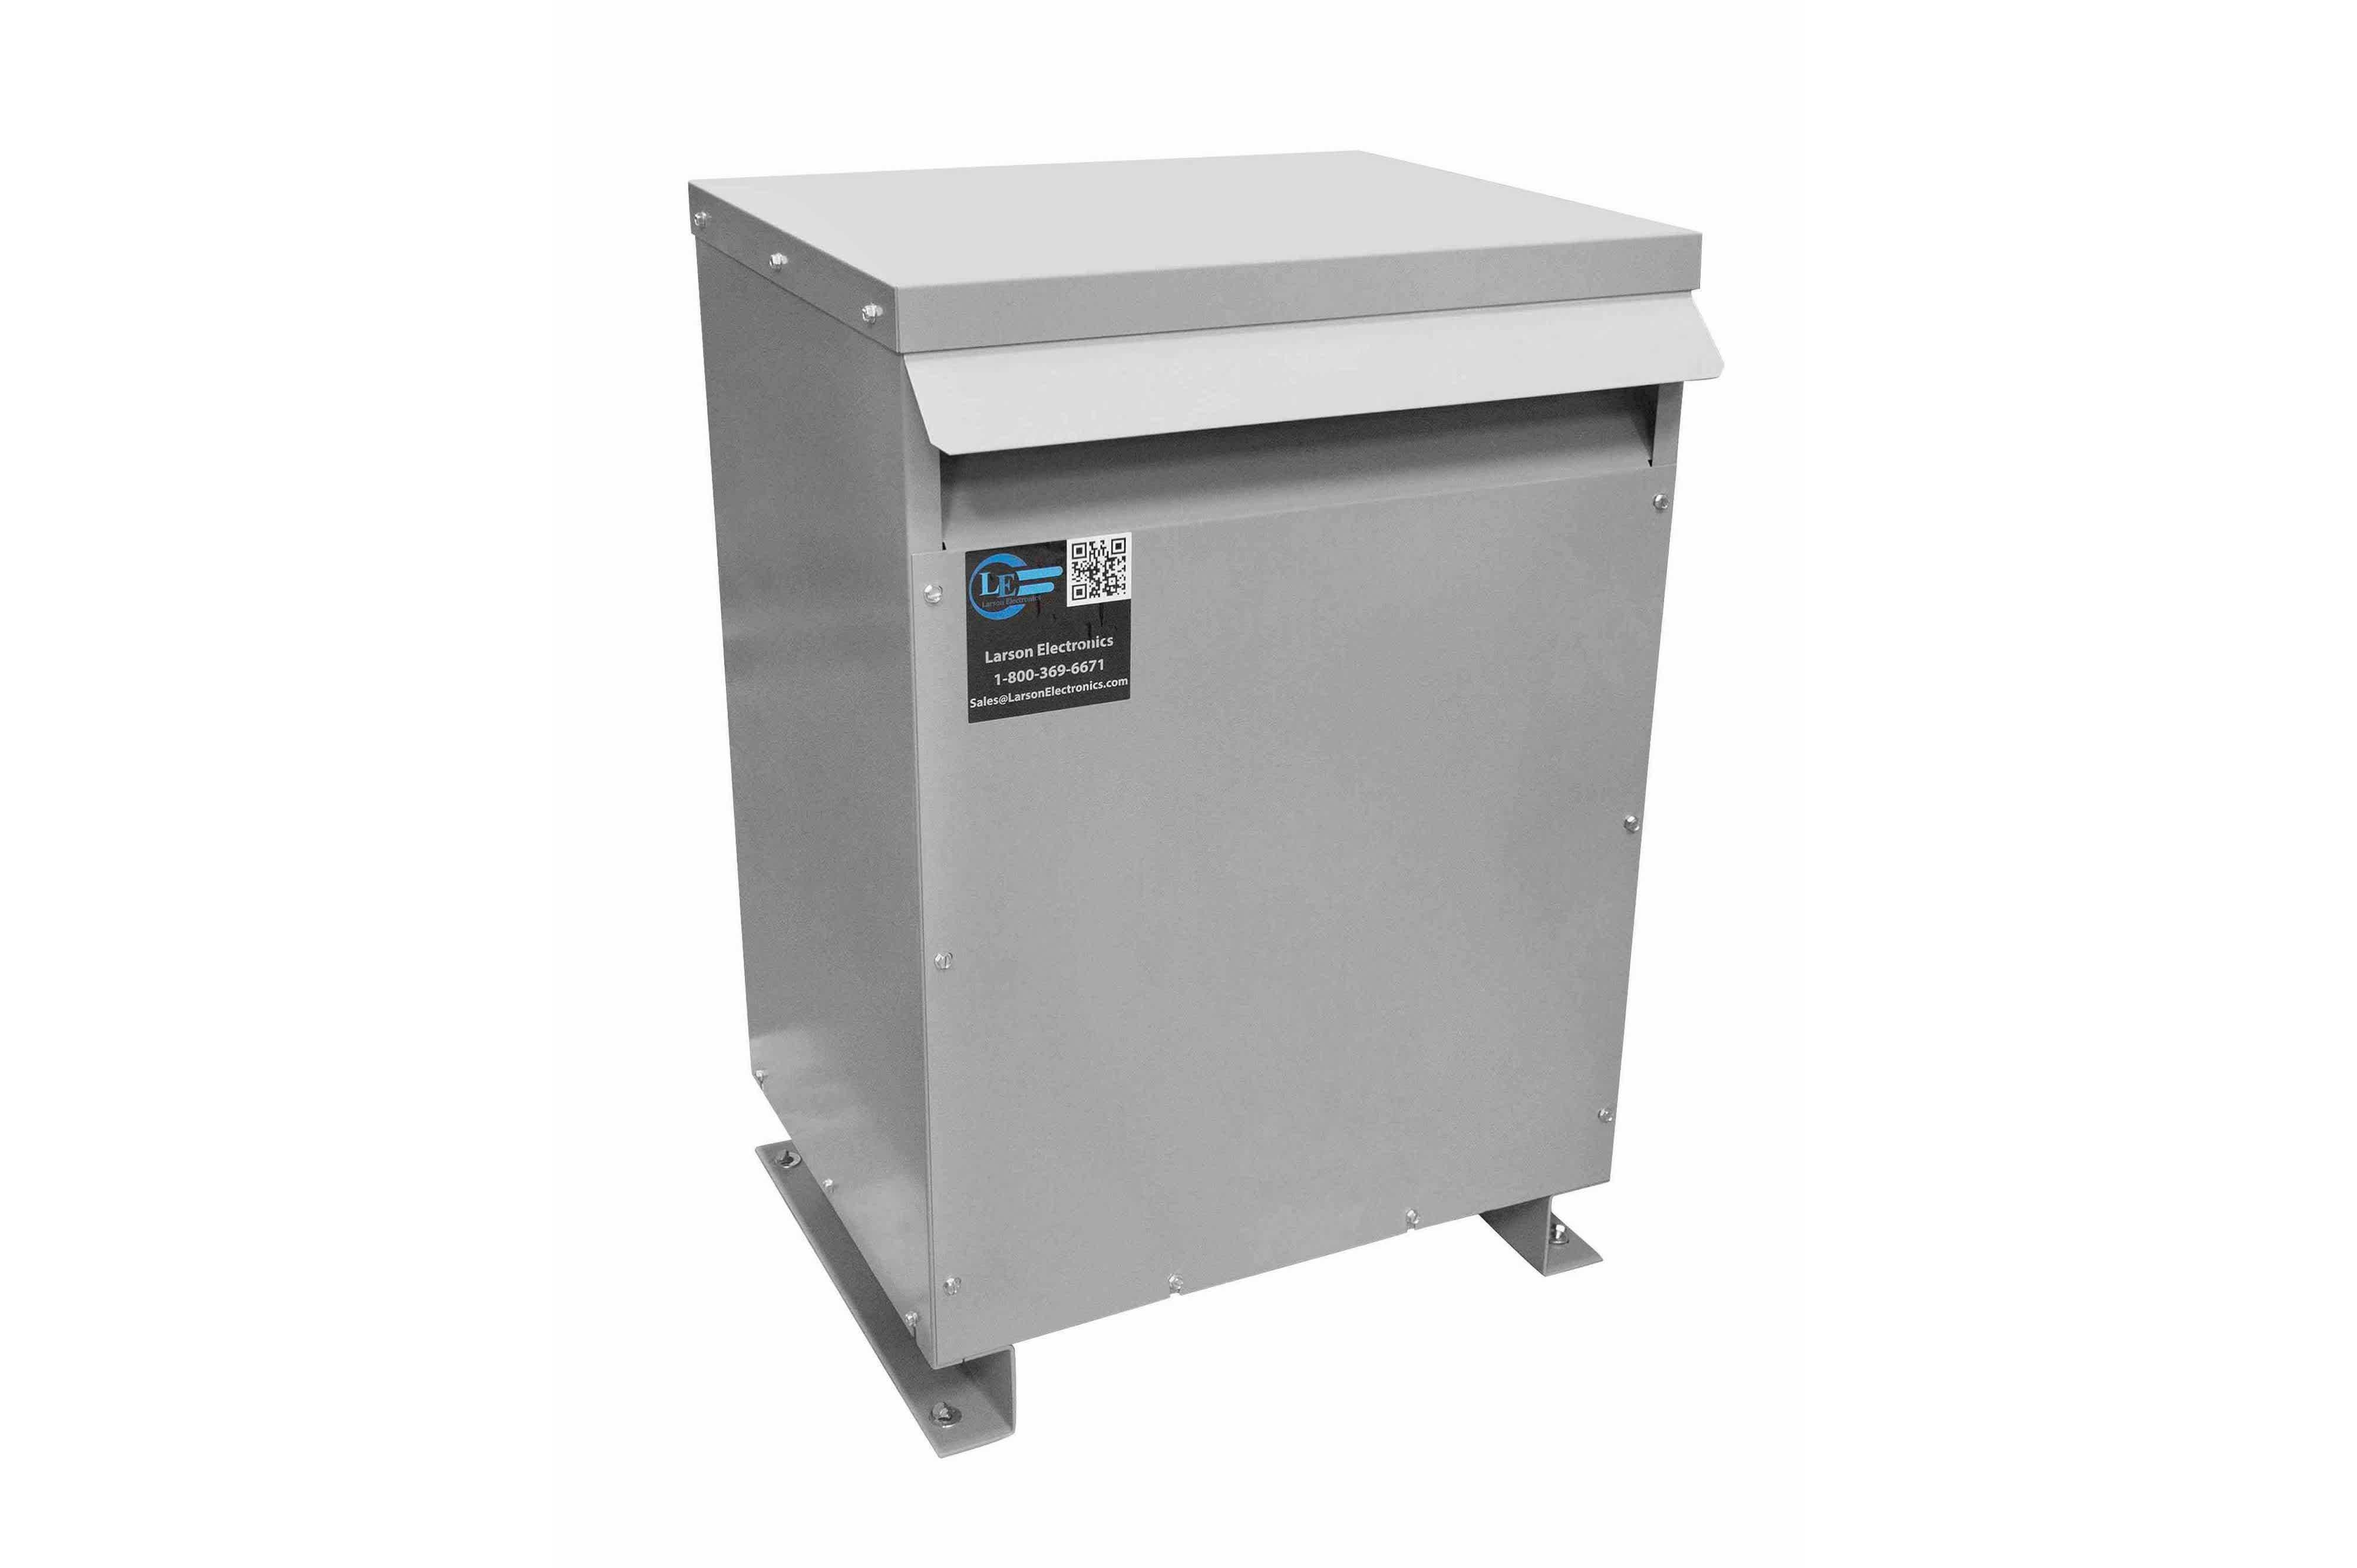 250 kVA 3PH DOE Transformer, 415V Delta Primary, 208Y/120 Wye-N Secondary, N3R, Ventilated, 60 Hz